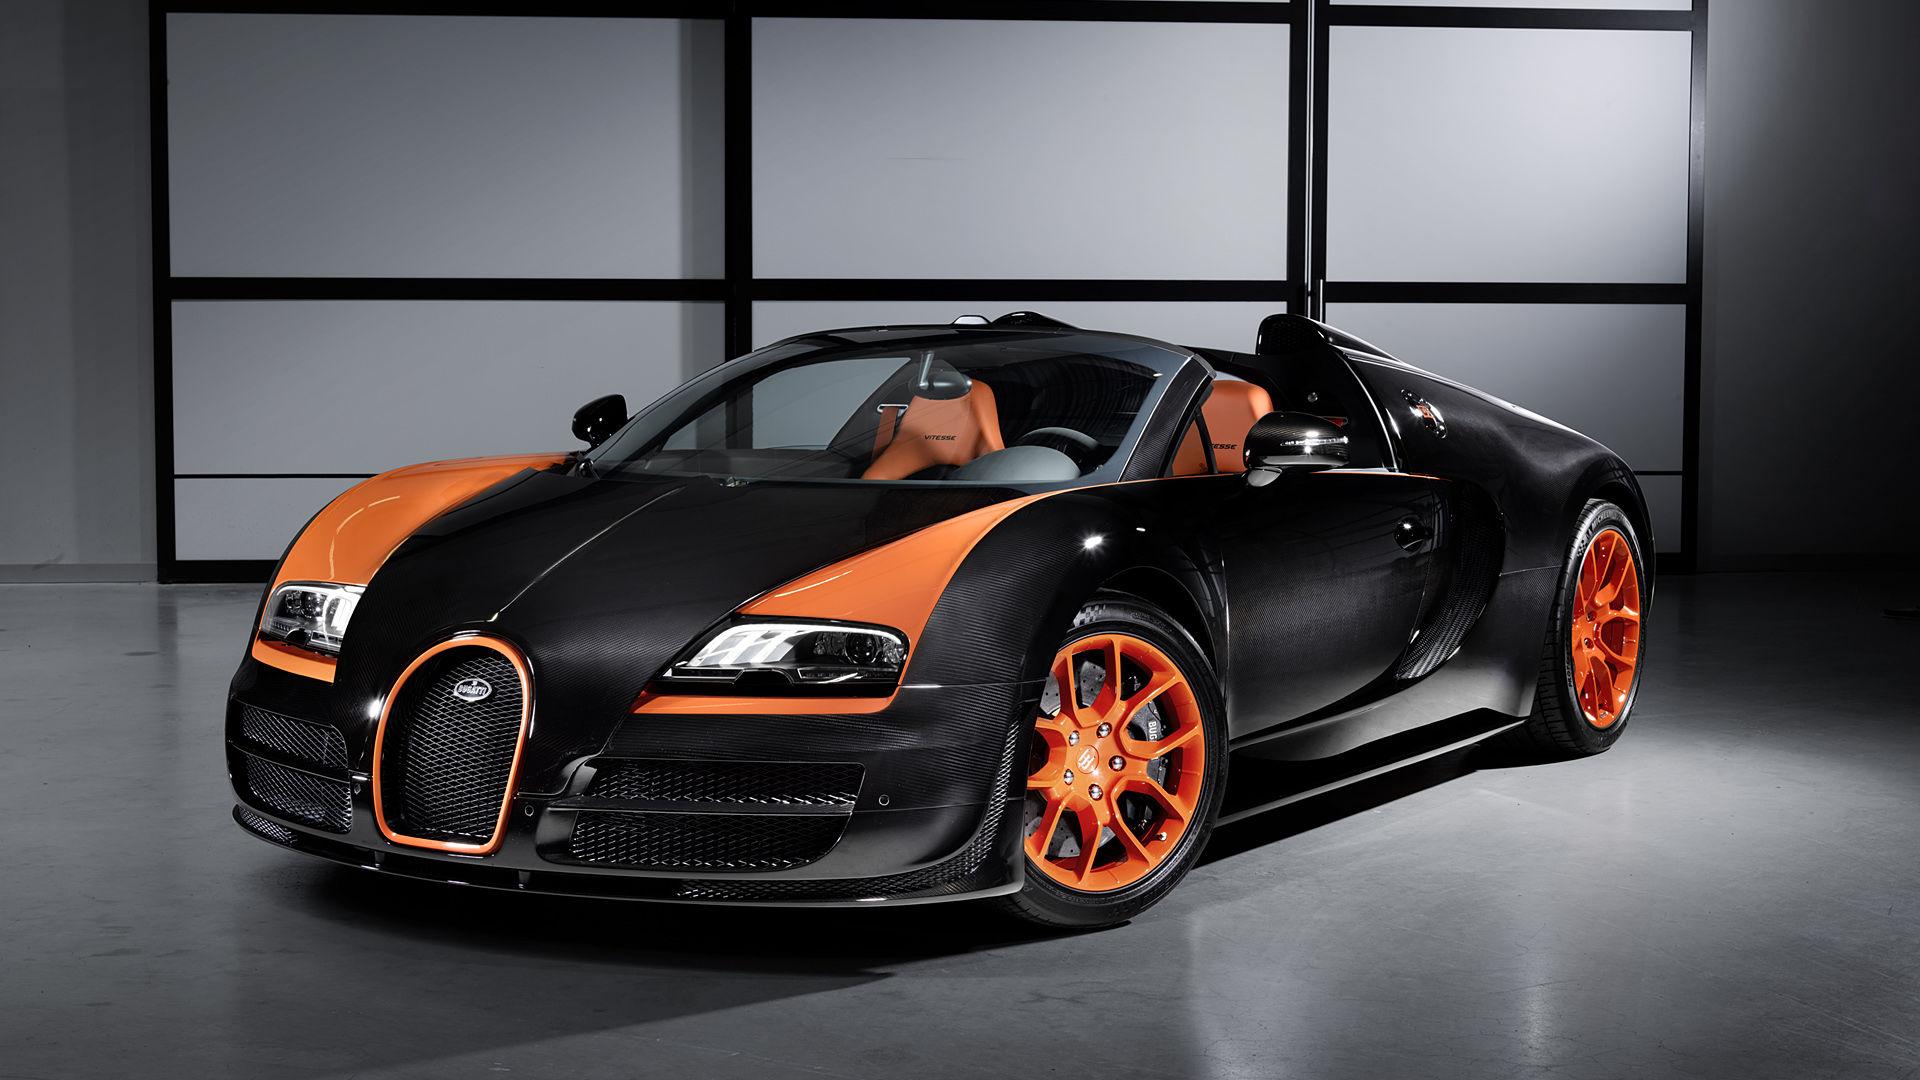 2013 Bugatti Veyron Vitesse World Speed Record